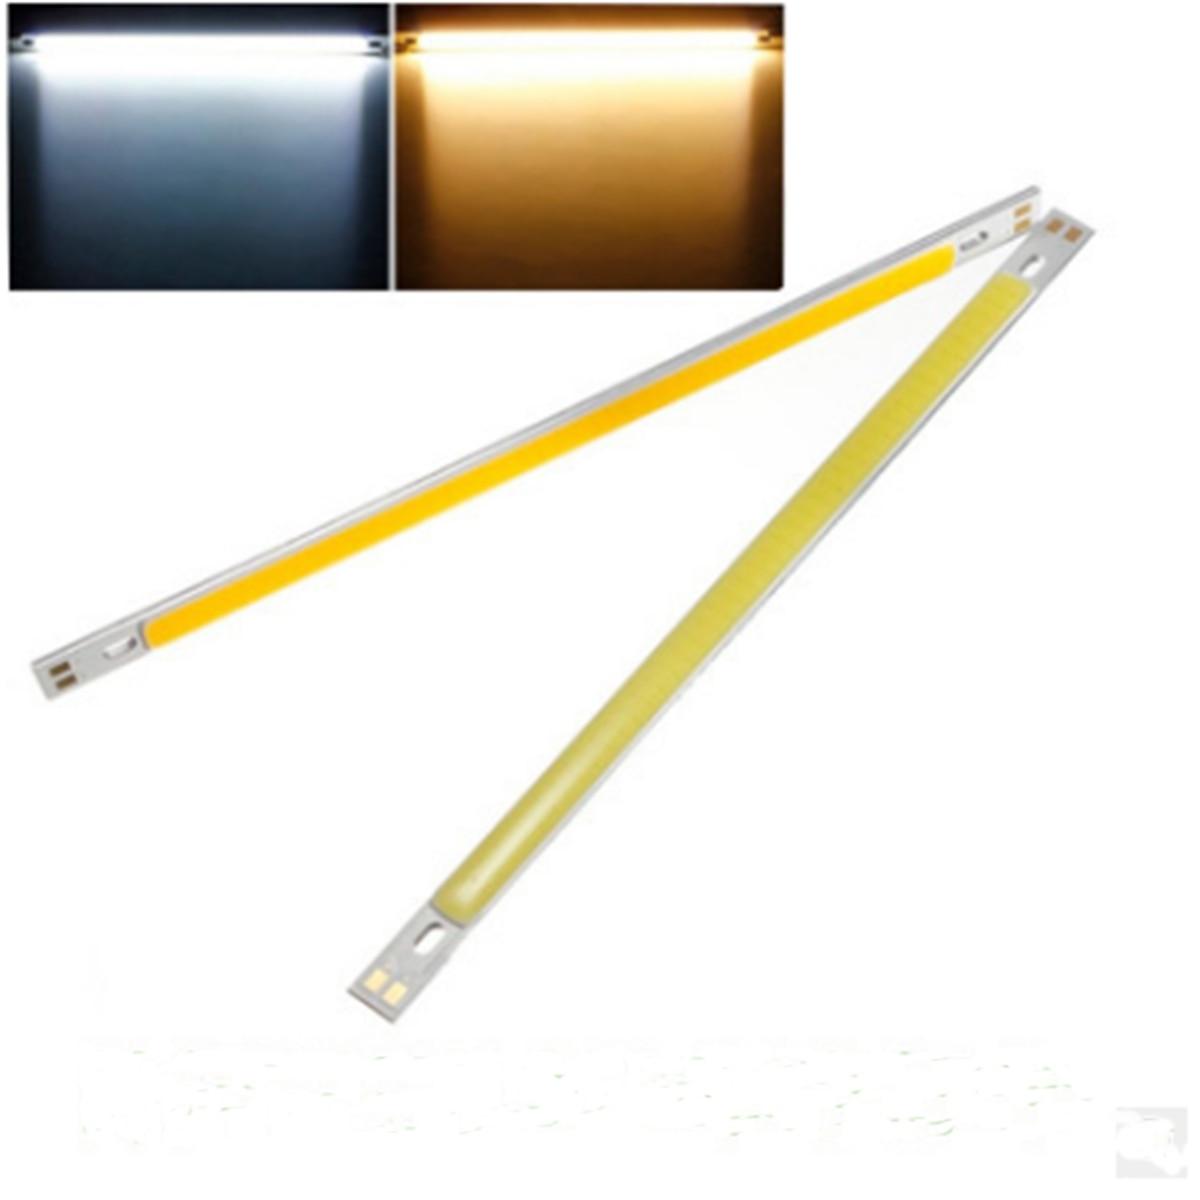 10W COB LED Chips LED tira de luz con forma de barra bombilla lámpara de inundación blanco puro blanco cálido 1000LM para iluminación DIY 200x10mm DC12-24V